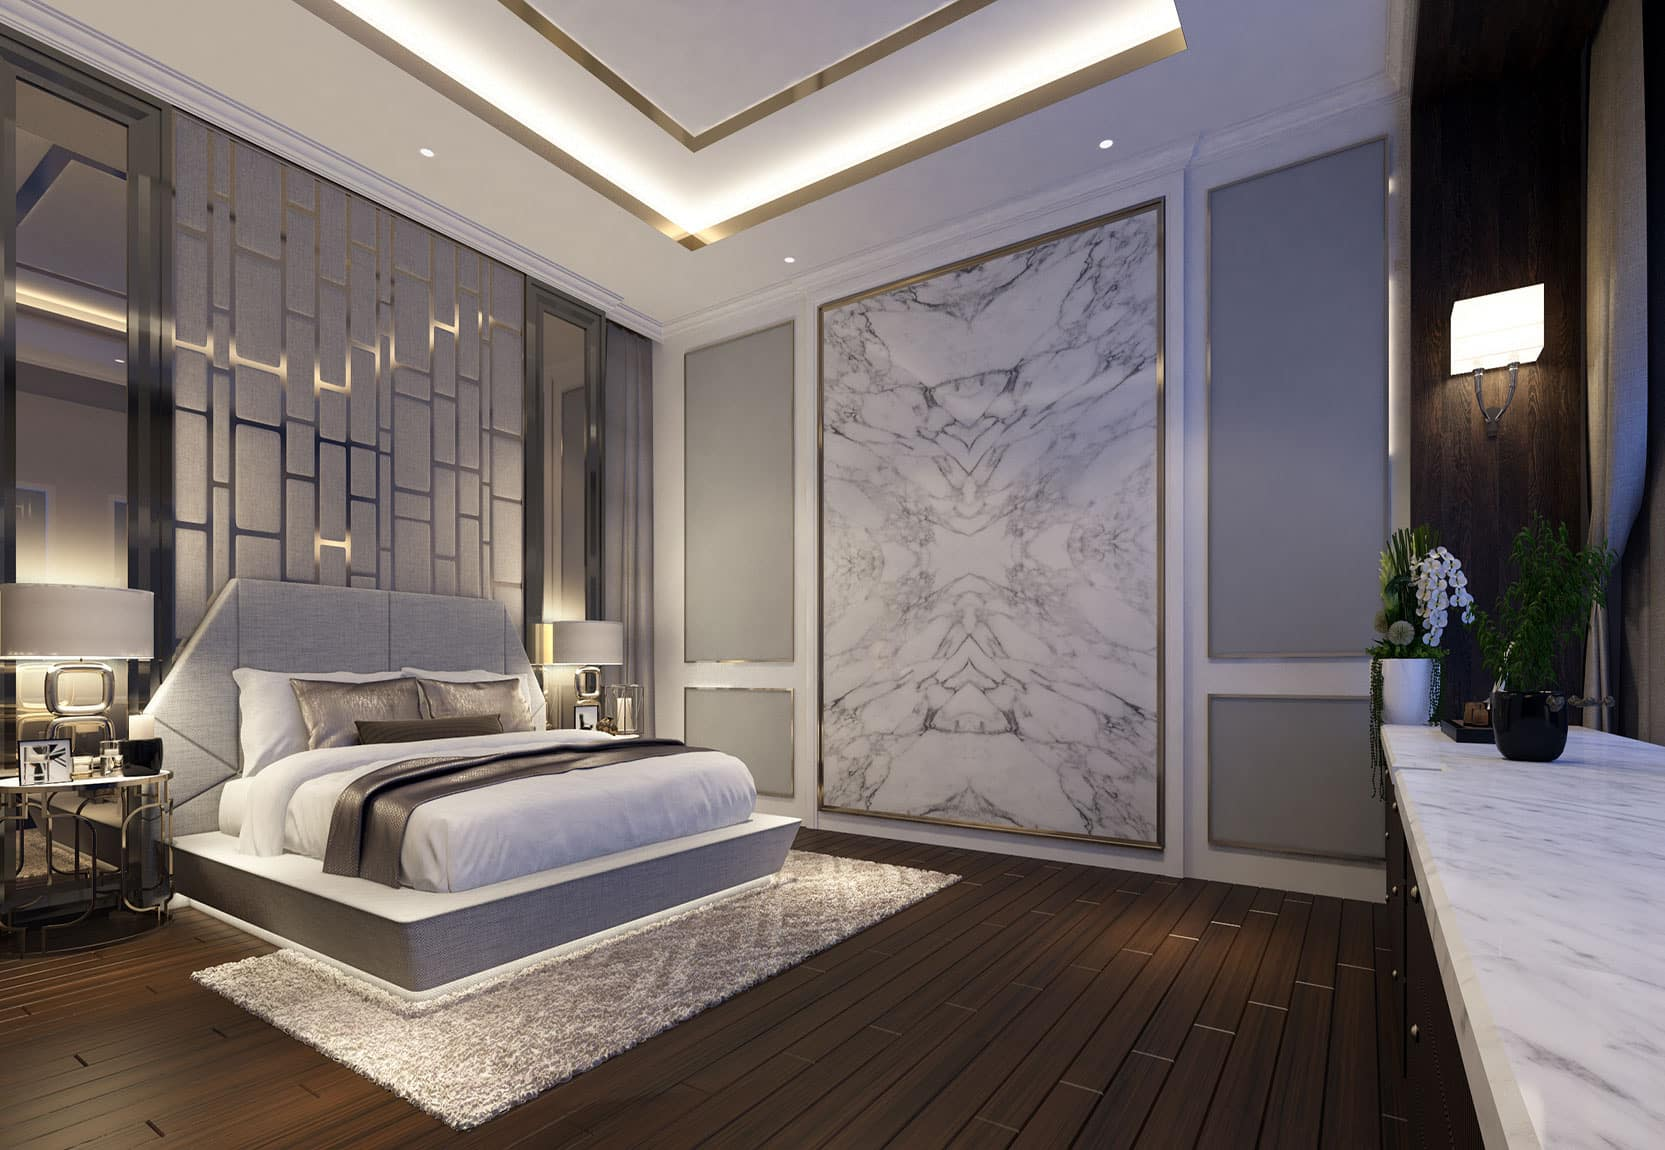 Desain Kamar Tidur Unik Bergaya Monokrom Thegorbalsla